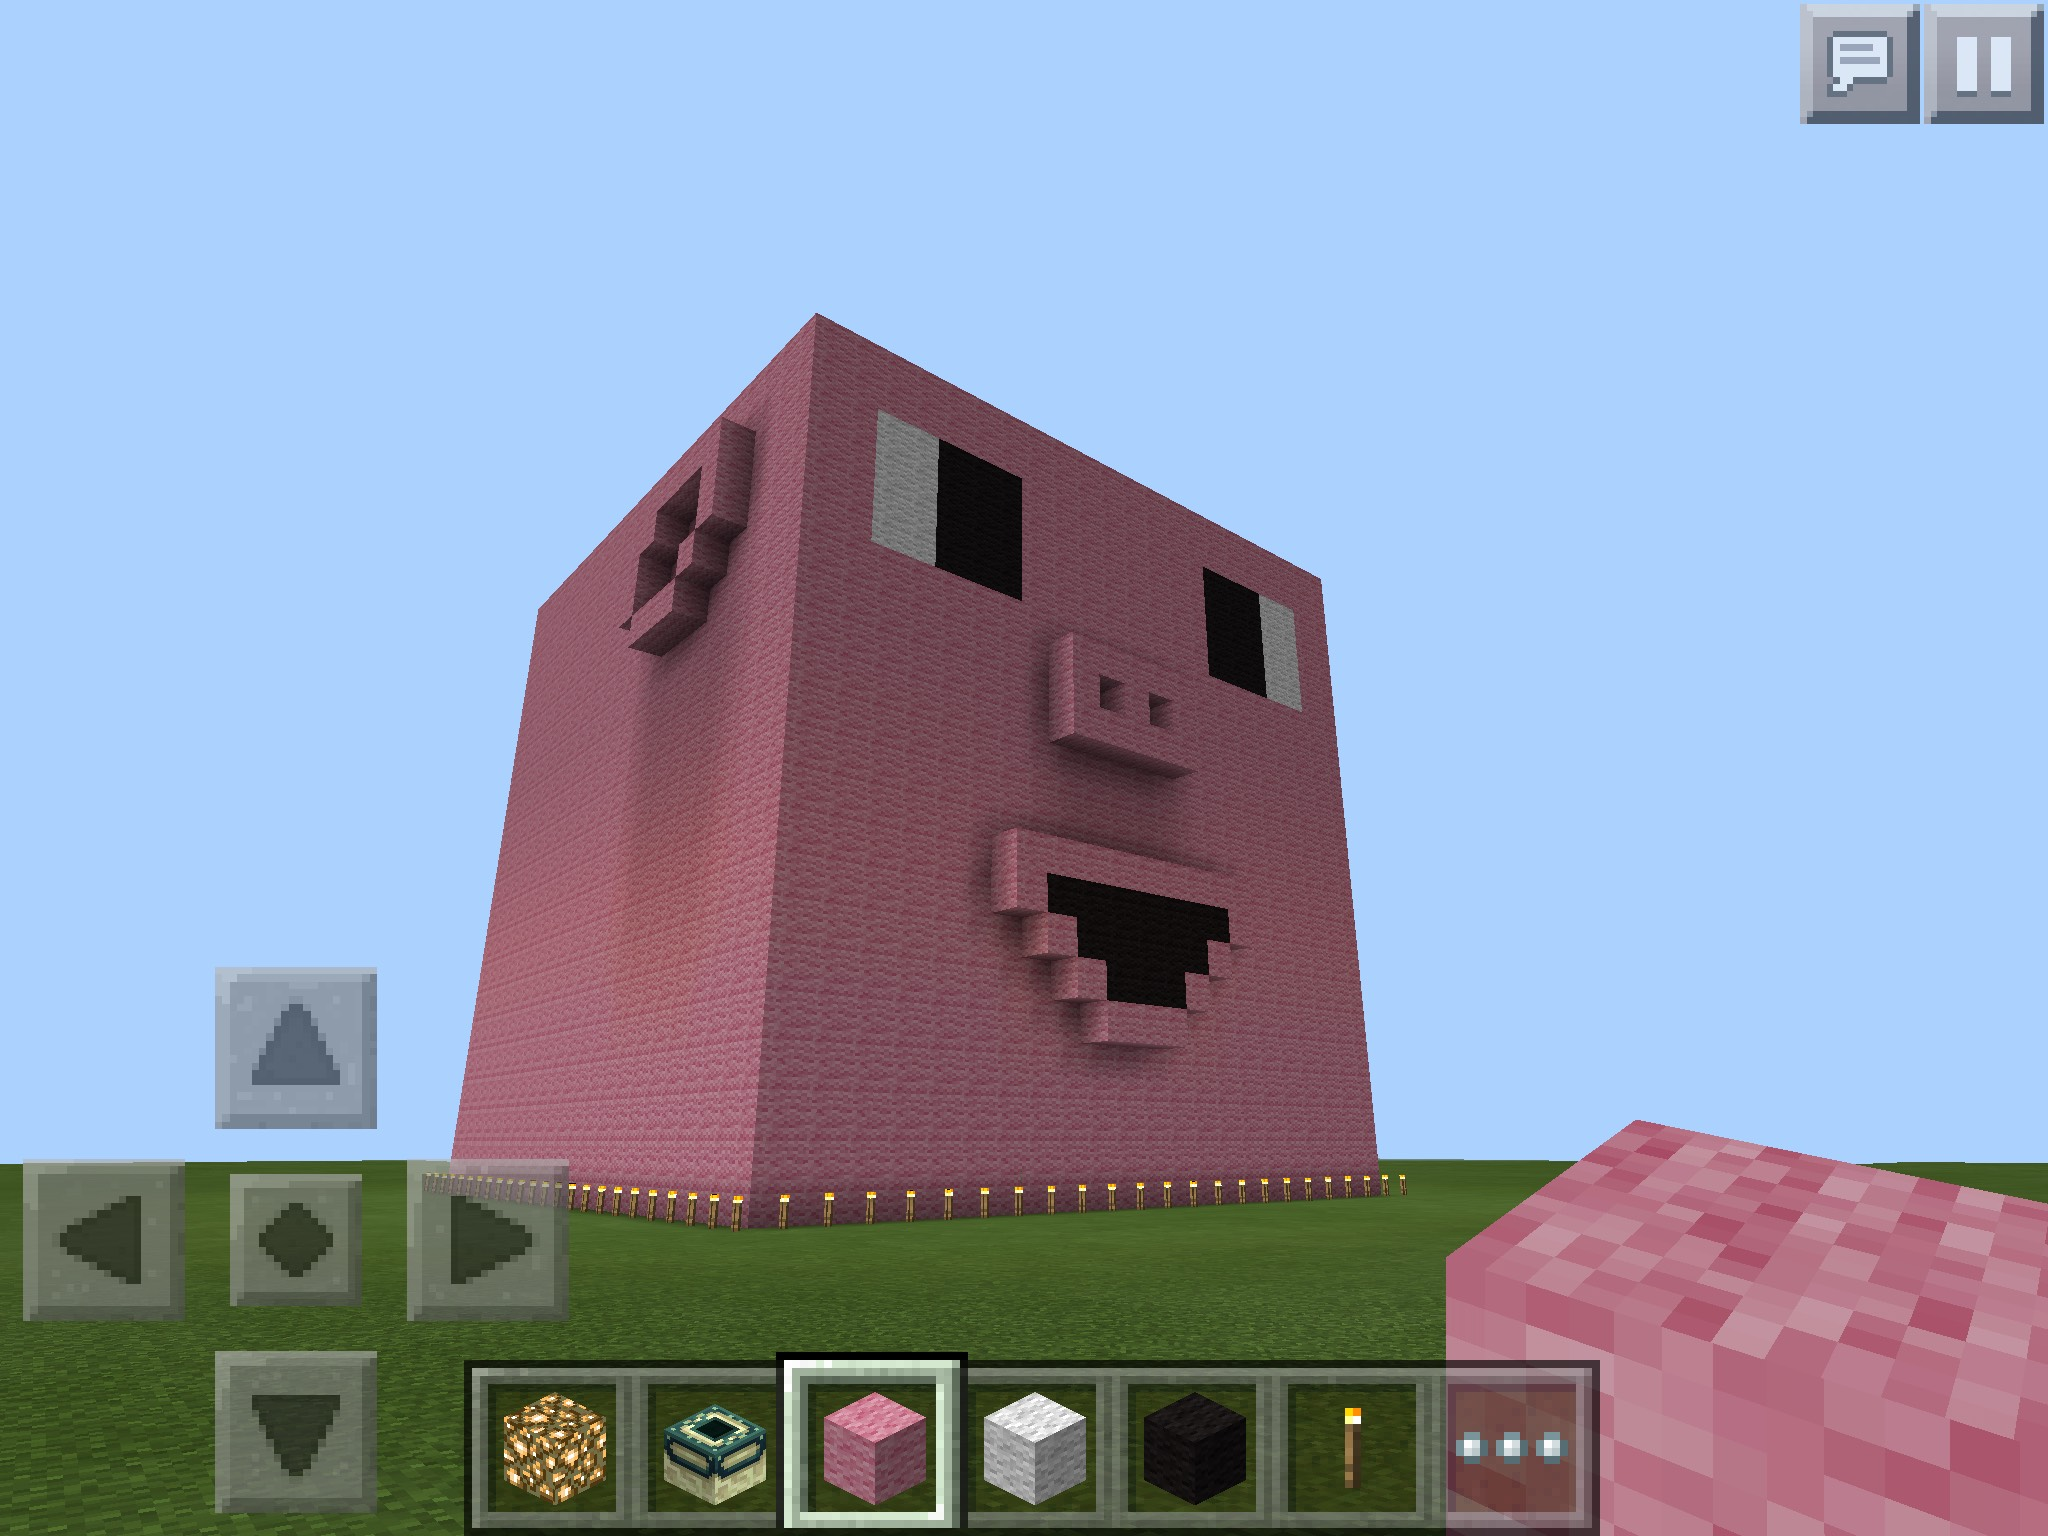 Giant Minecraft Cute Pig Head